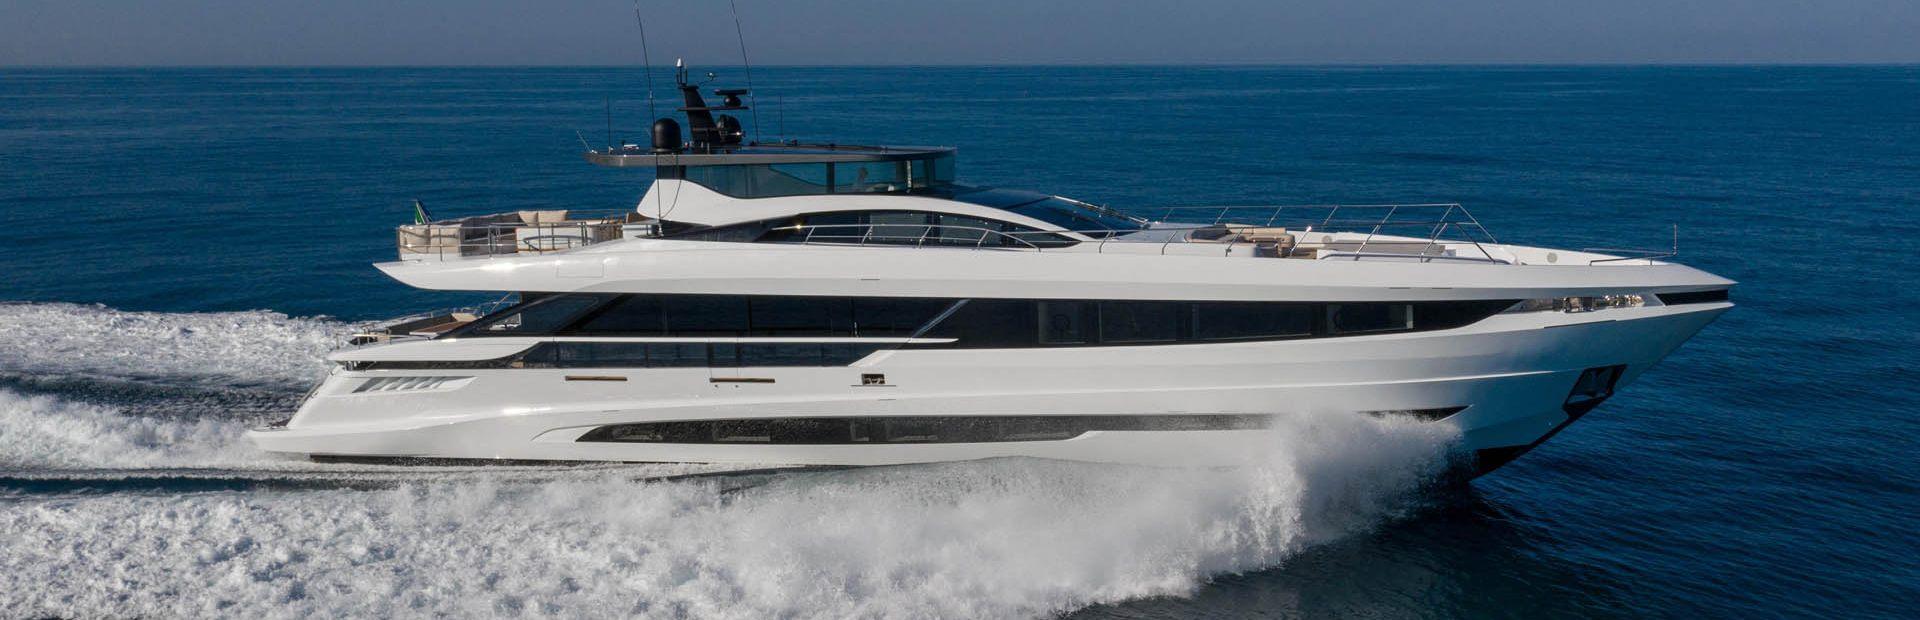 Mangusta GranSport 33 Yacht Charter